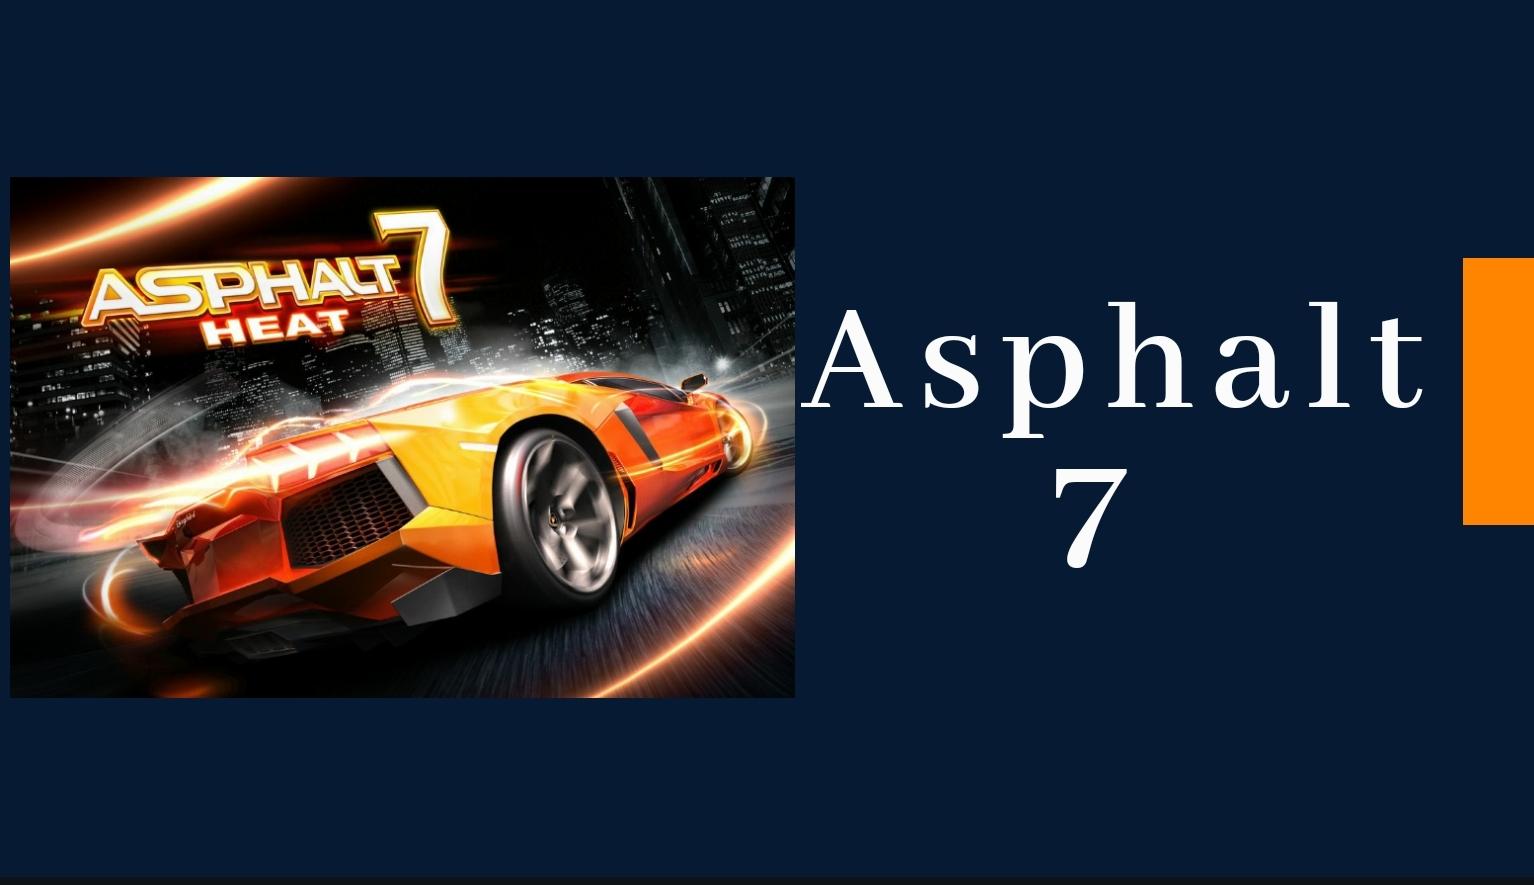 asphalt 7 mod apk